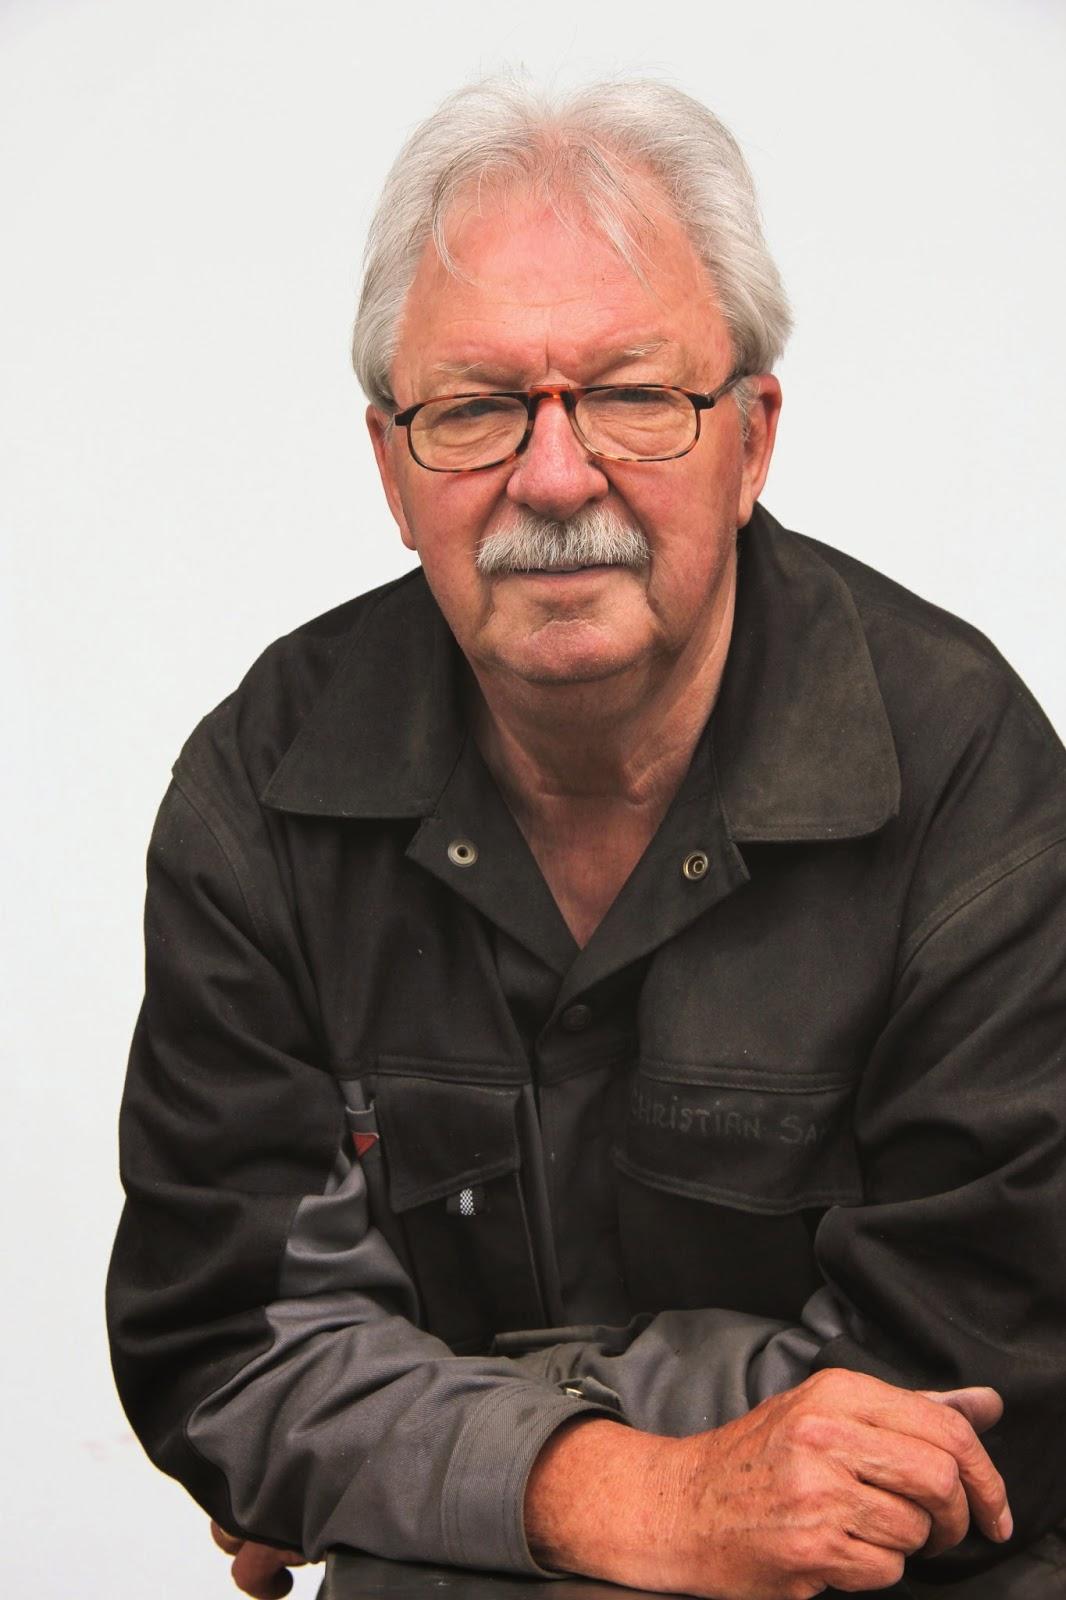 Christian sahli eisenplastiker biografie for Christian koch architekt